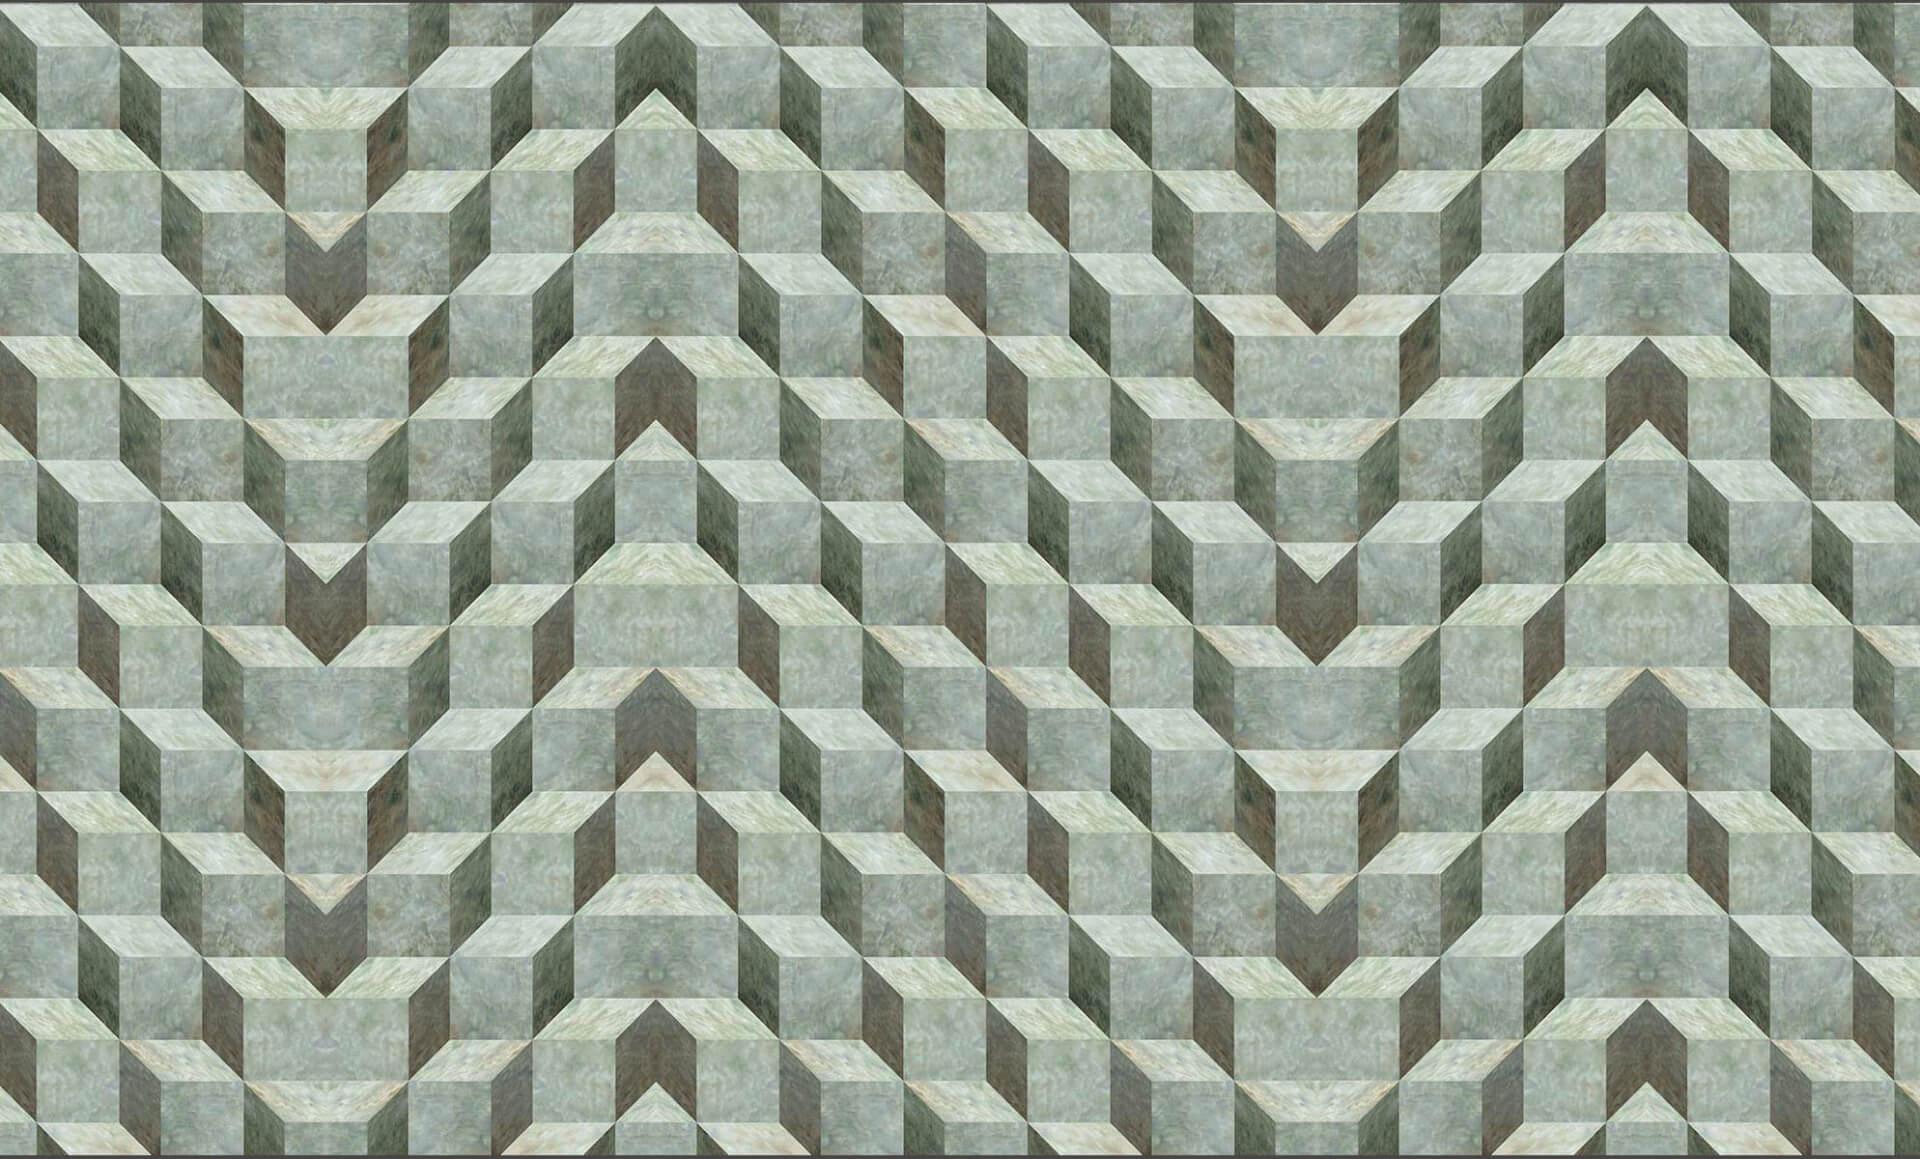 3-D Green Glaze Cubes - Mayan Variation Doug Garrabrants